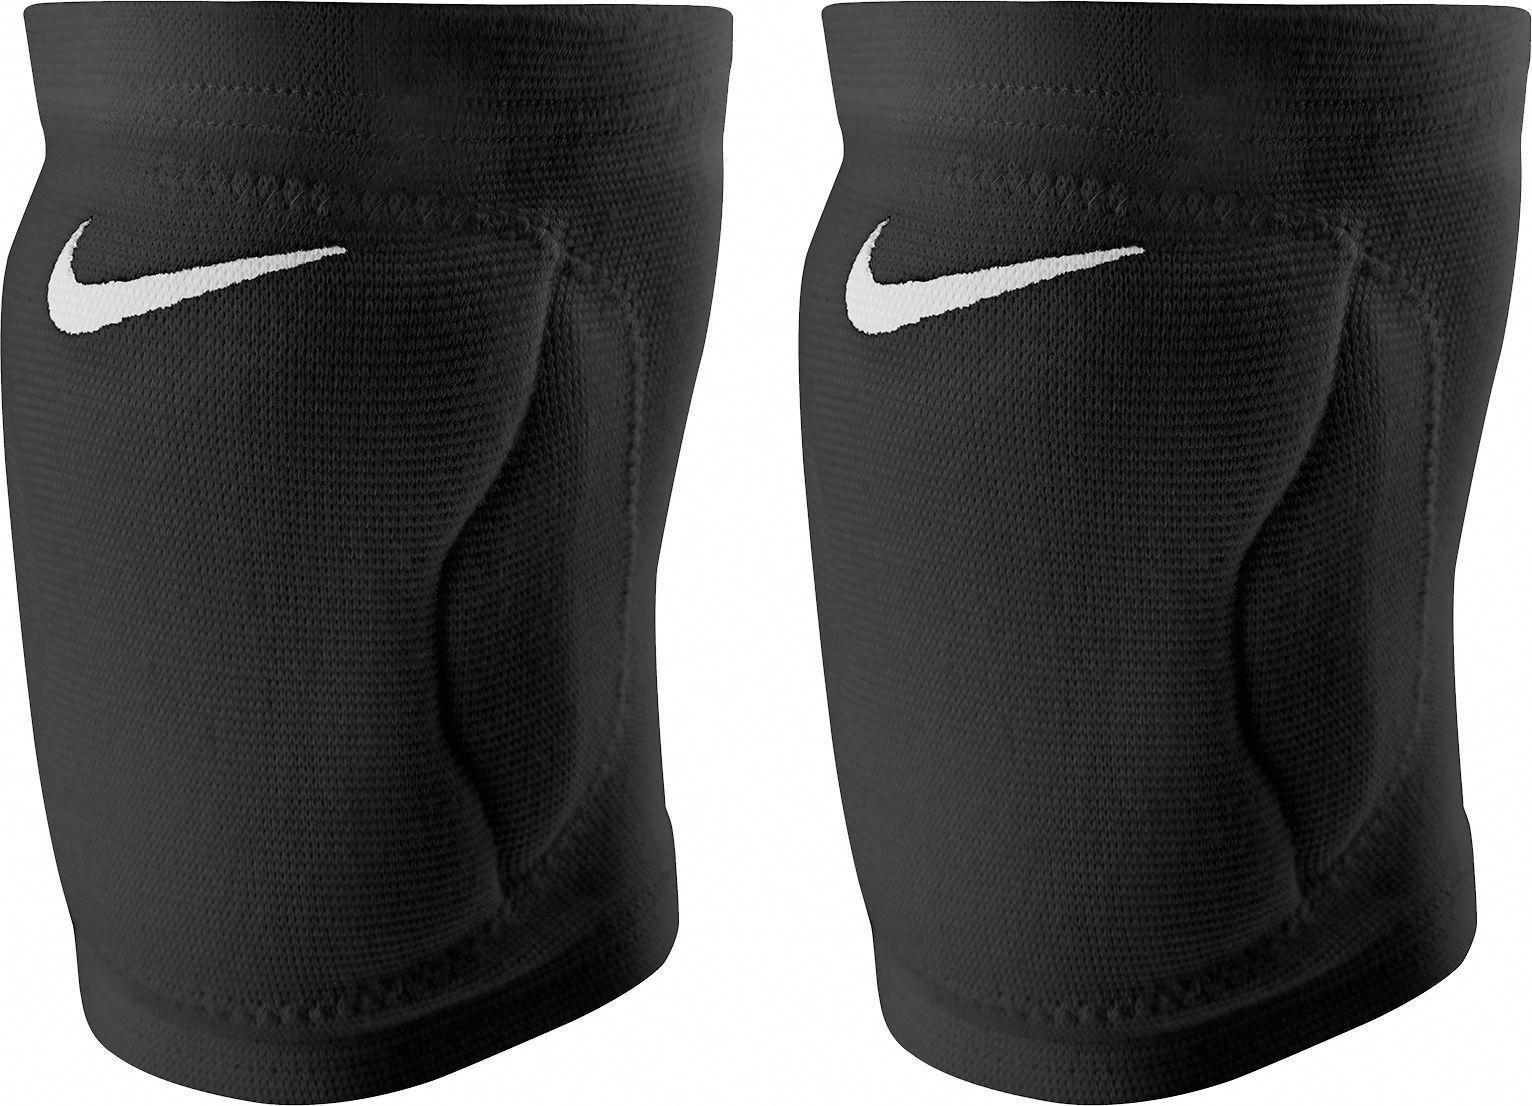 Nike Streak Volleyball Knee Pads Black Volleyball Outfits Volleyball Knee Pads Nike Volleyball